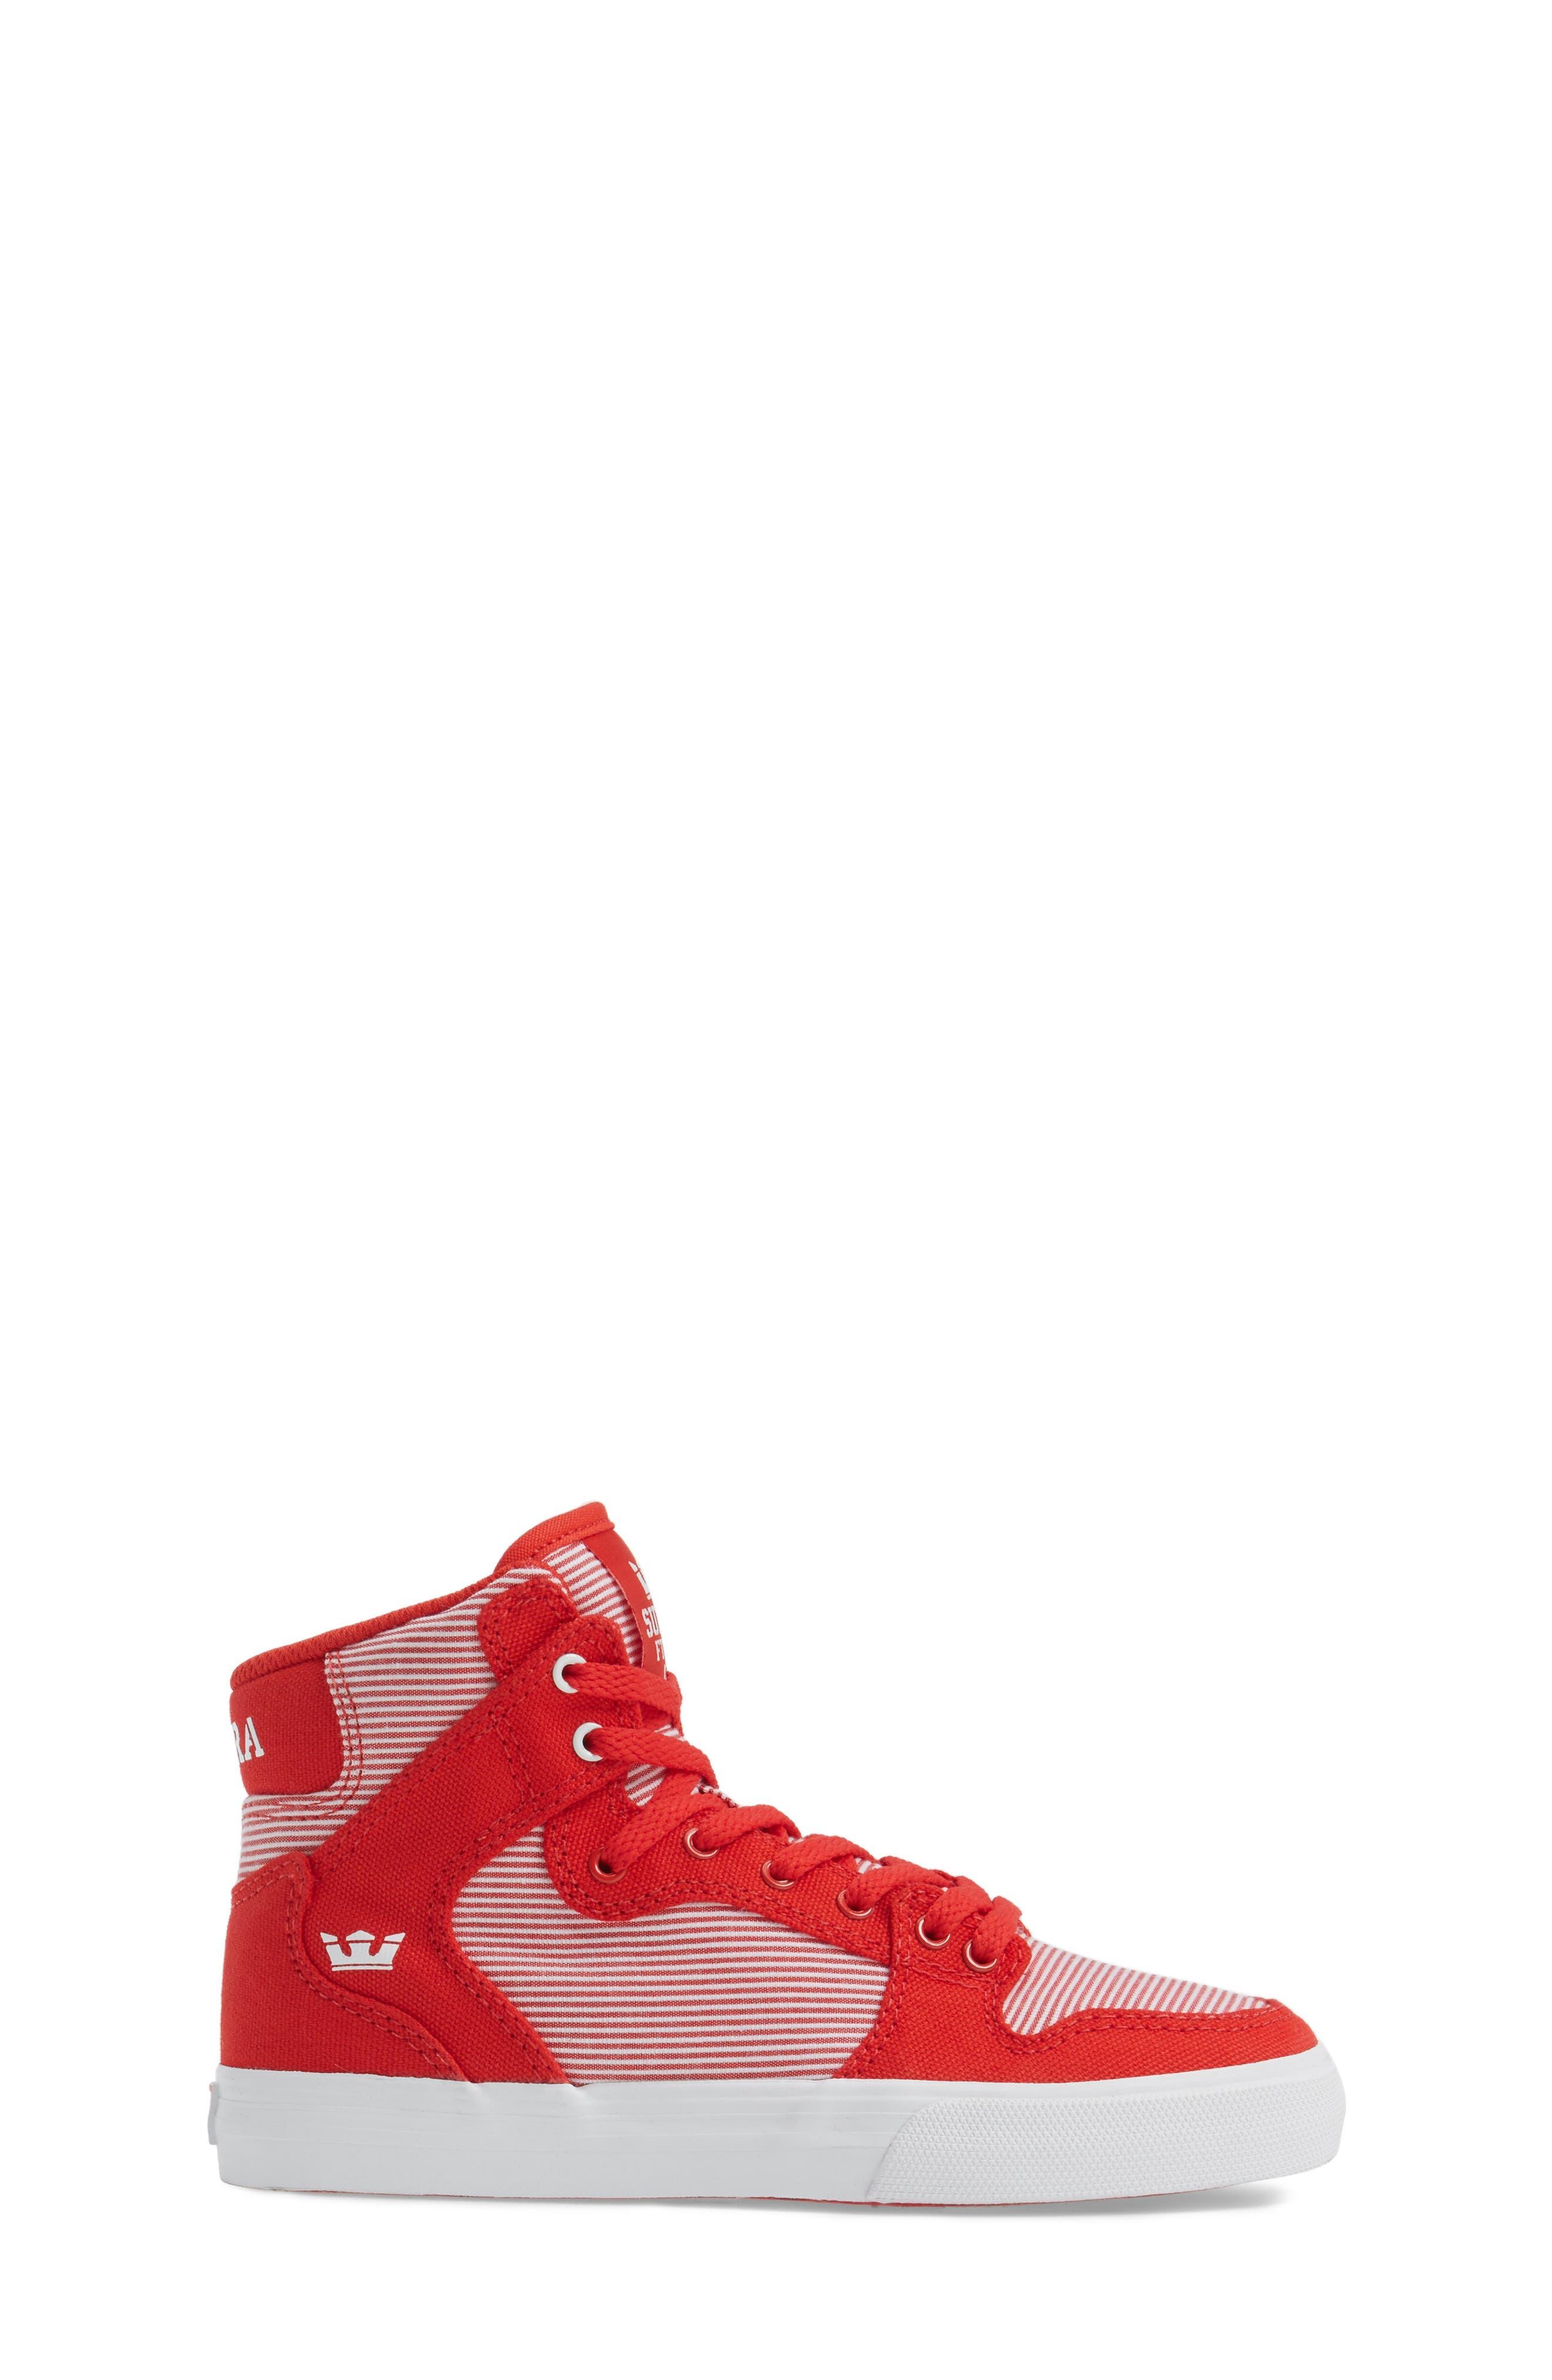 Alternate Image 3  - Supra Vaider High Top Sneaker (Toddler, Little Kid & Big Kid)